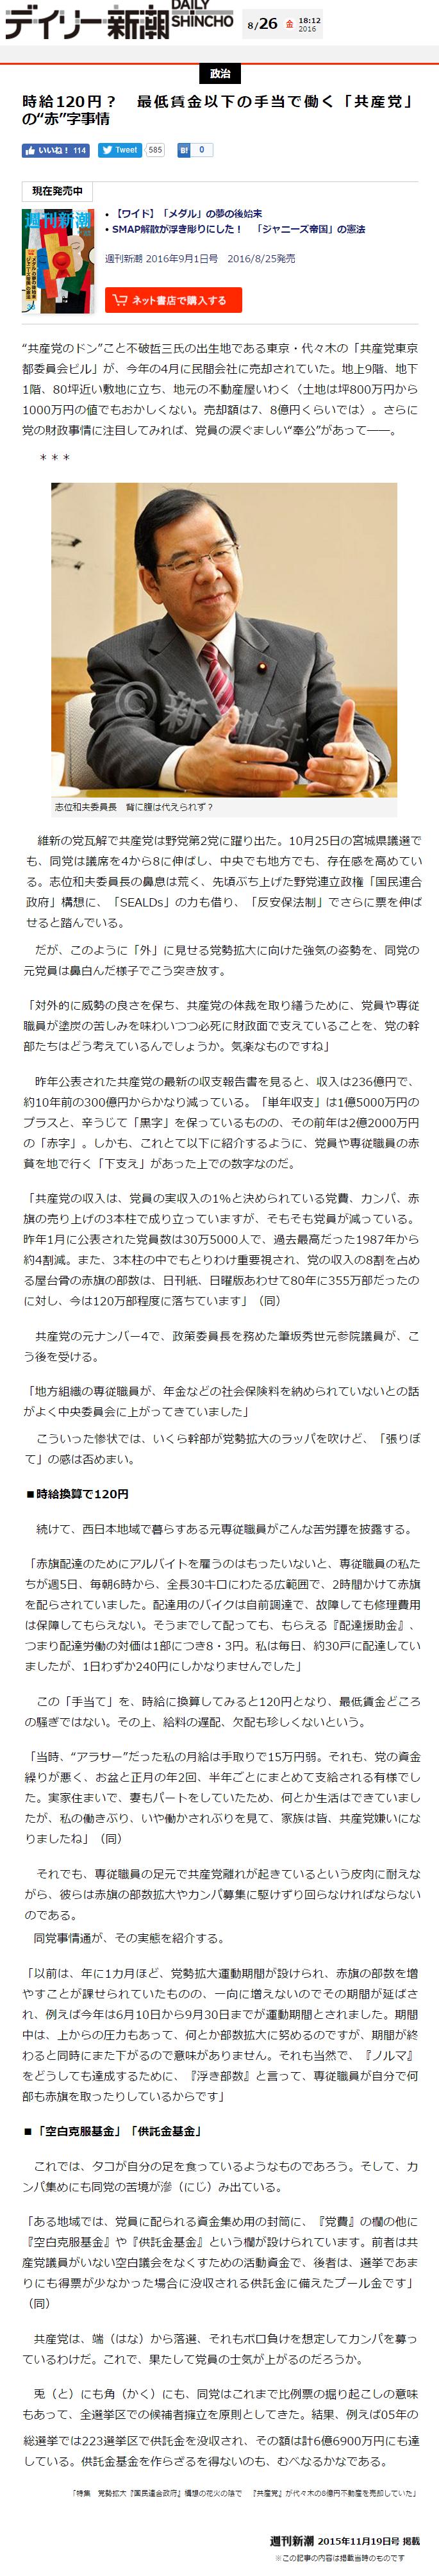 "時給120円 最低賃金以下の手当で働く「共産党」の""赤""字事情"